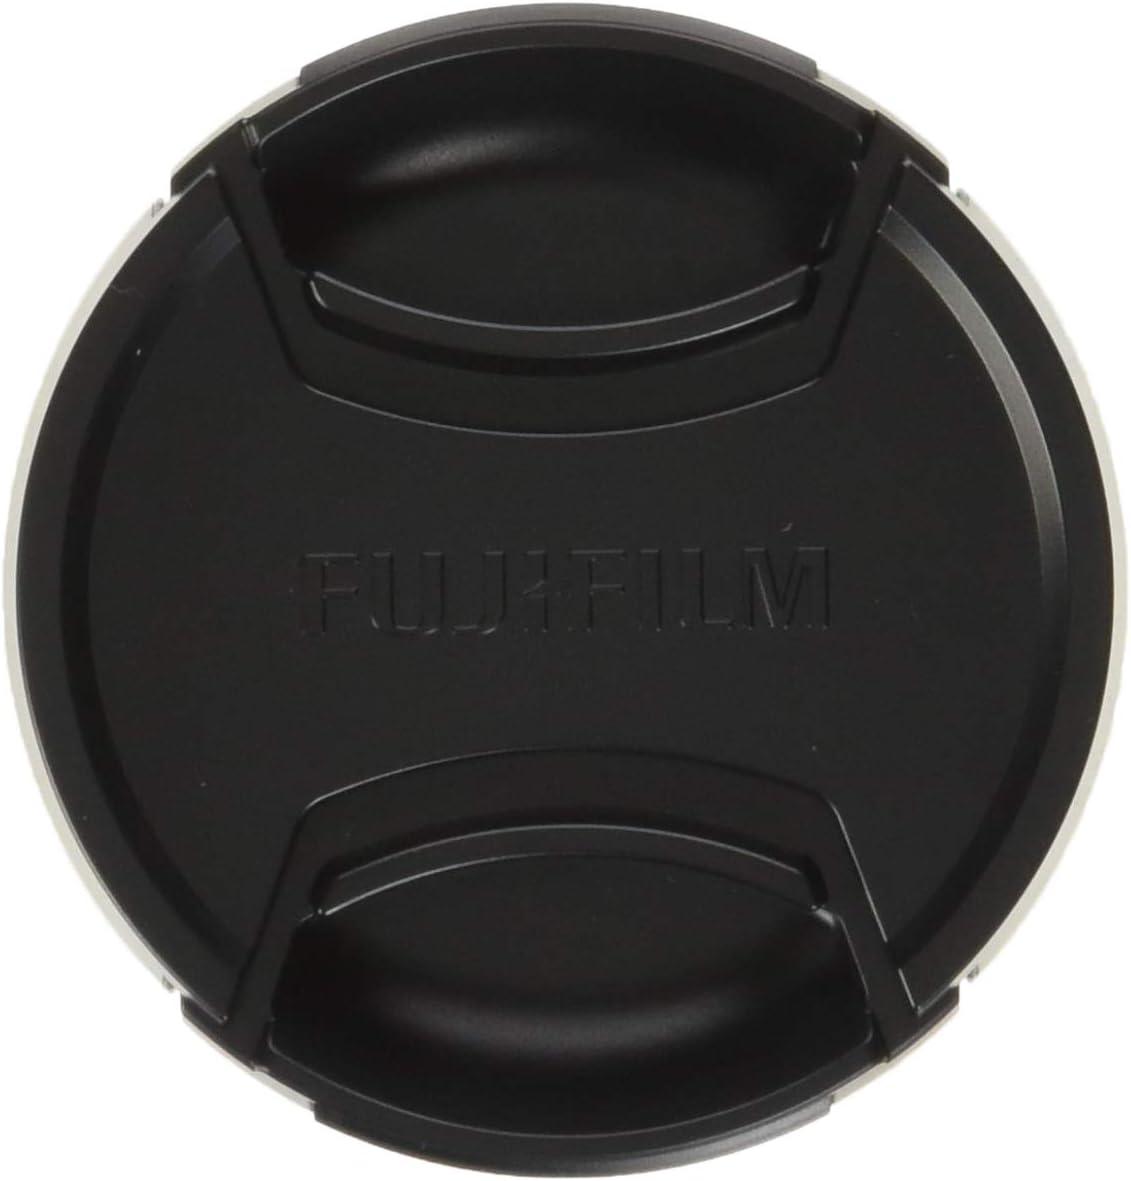 Fujifilm 58mm X Series Front Lens Cap